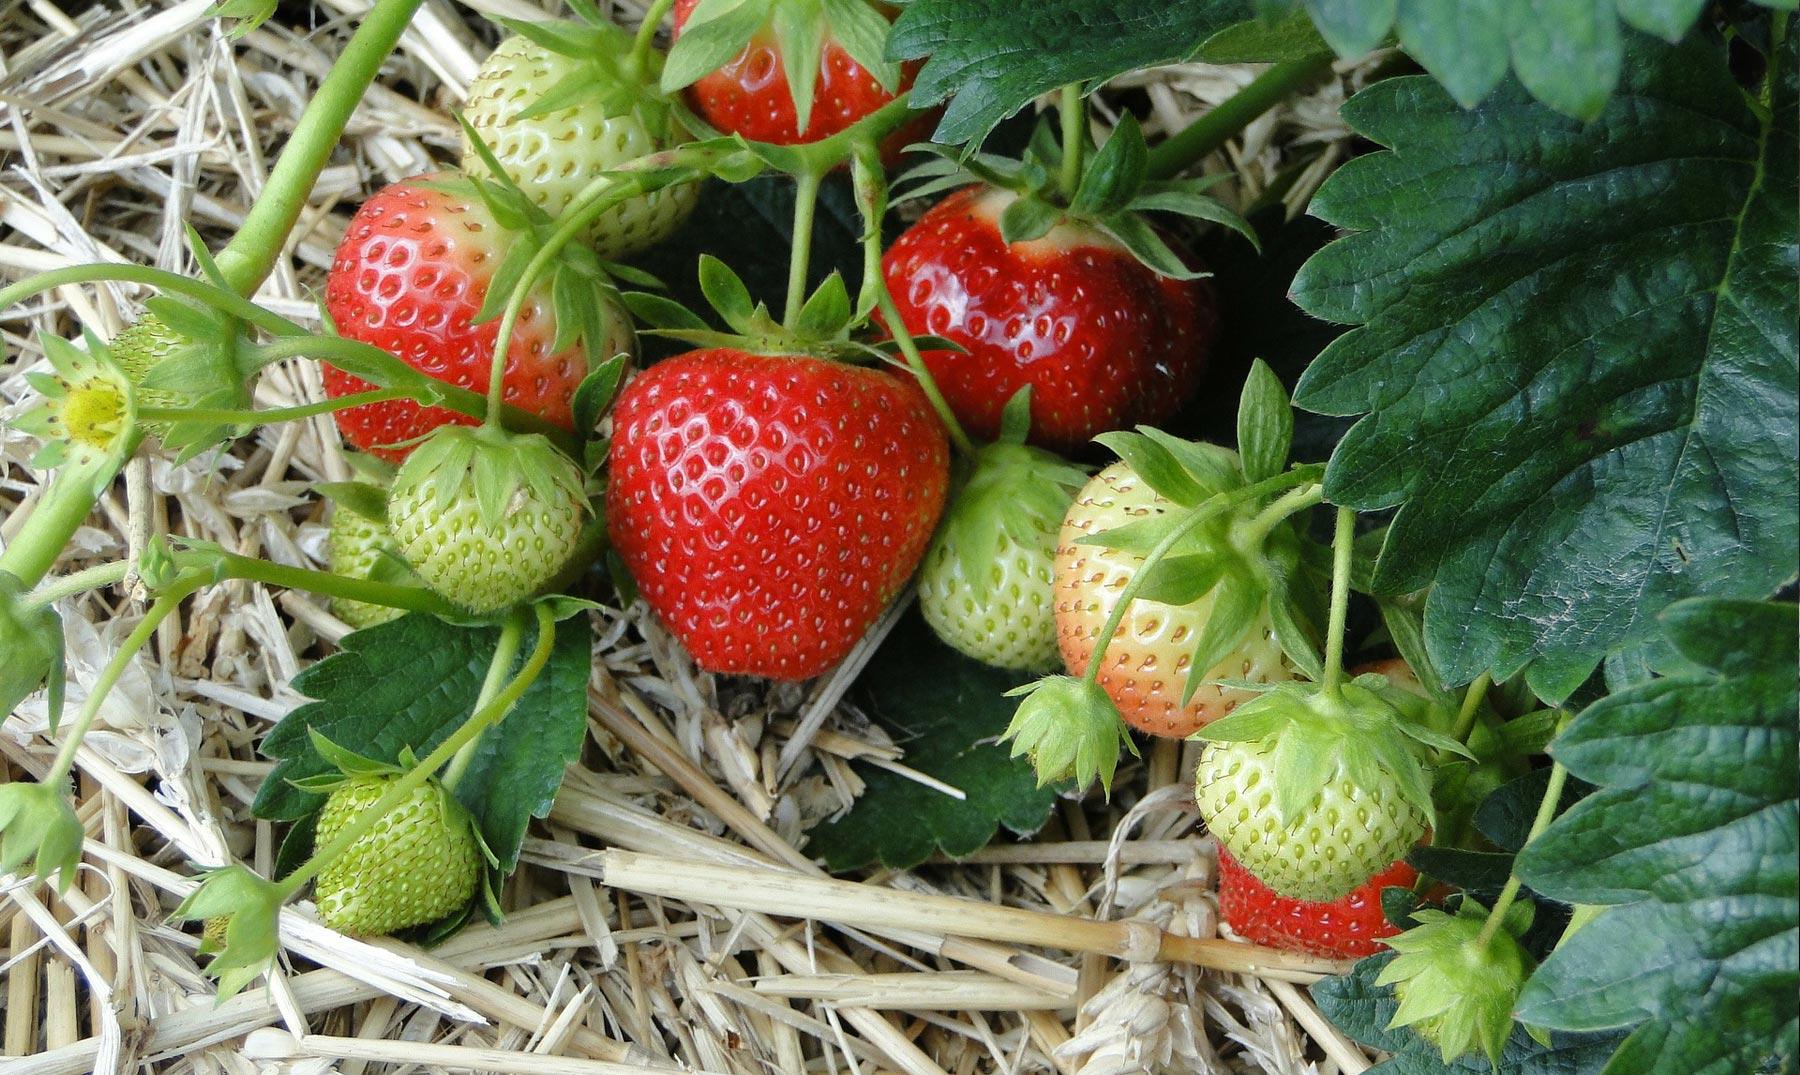 Fresas: reinas de la salud natural